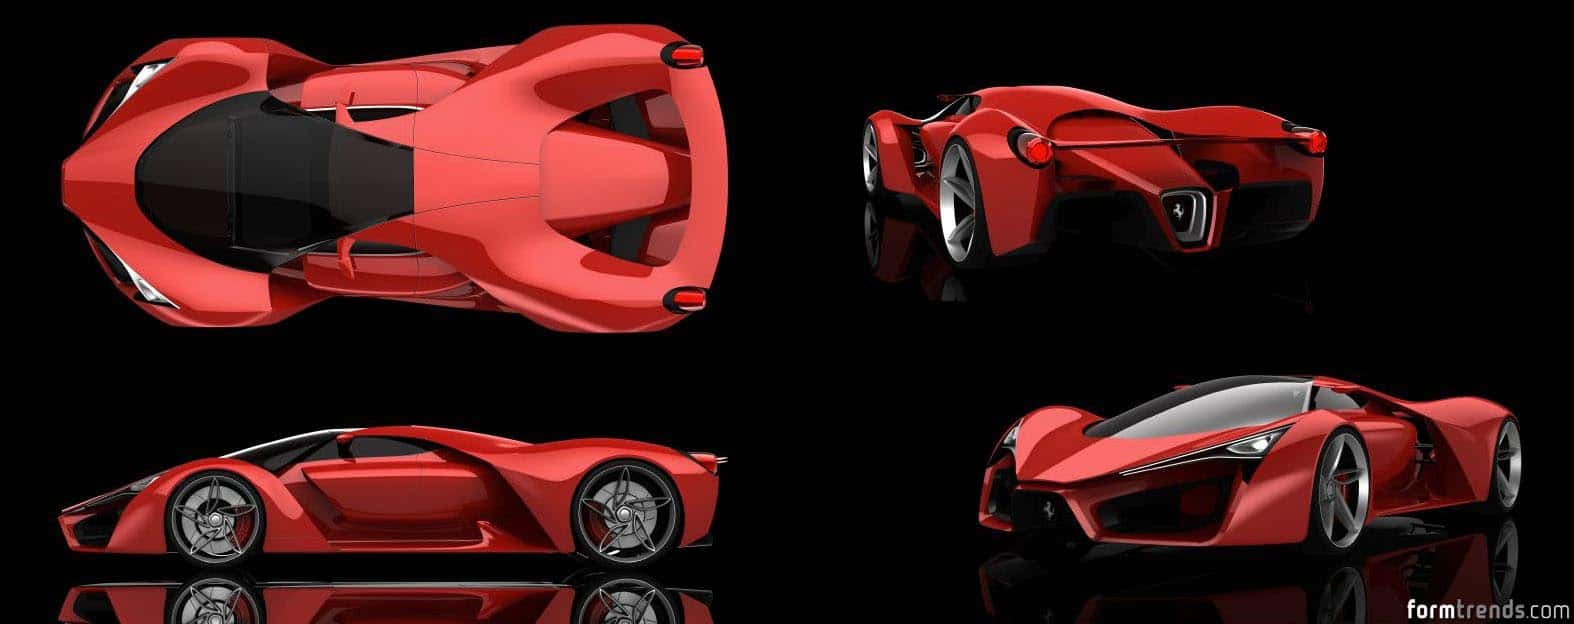 Ferrari F80 Concept Rendering By Adriano Raeli. Ferrari F80 Concept  Rendering By Adriano Raeli